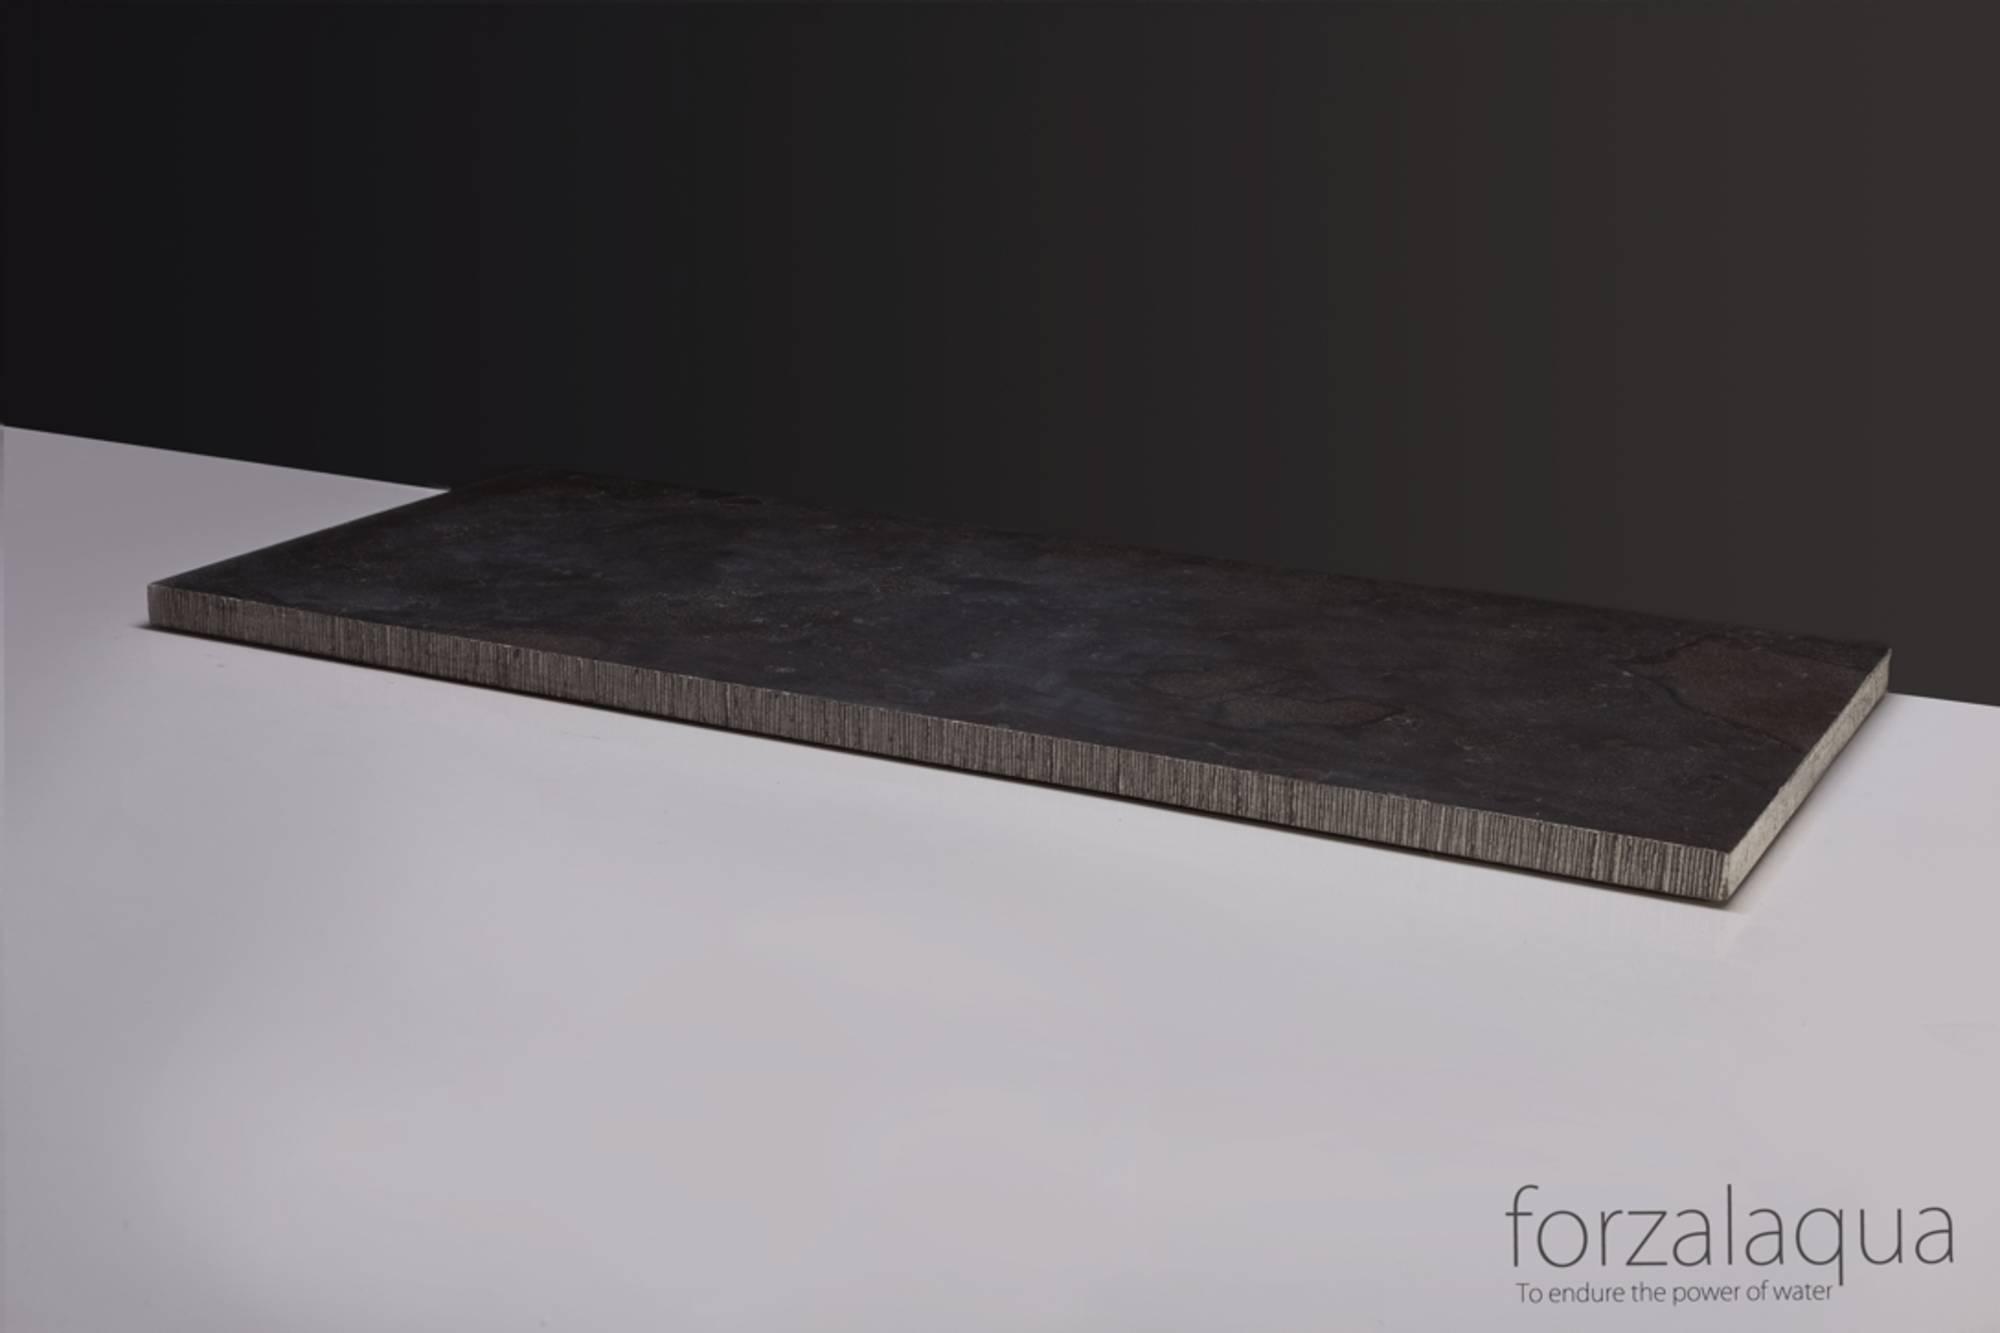 Forzalaqua Plateau 140,5 x 51,5 x 3,0 cm Hardsteen gefrijnd